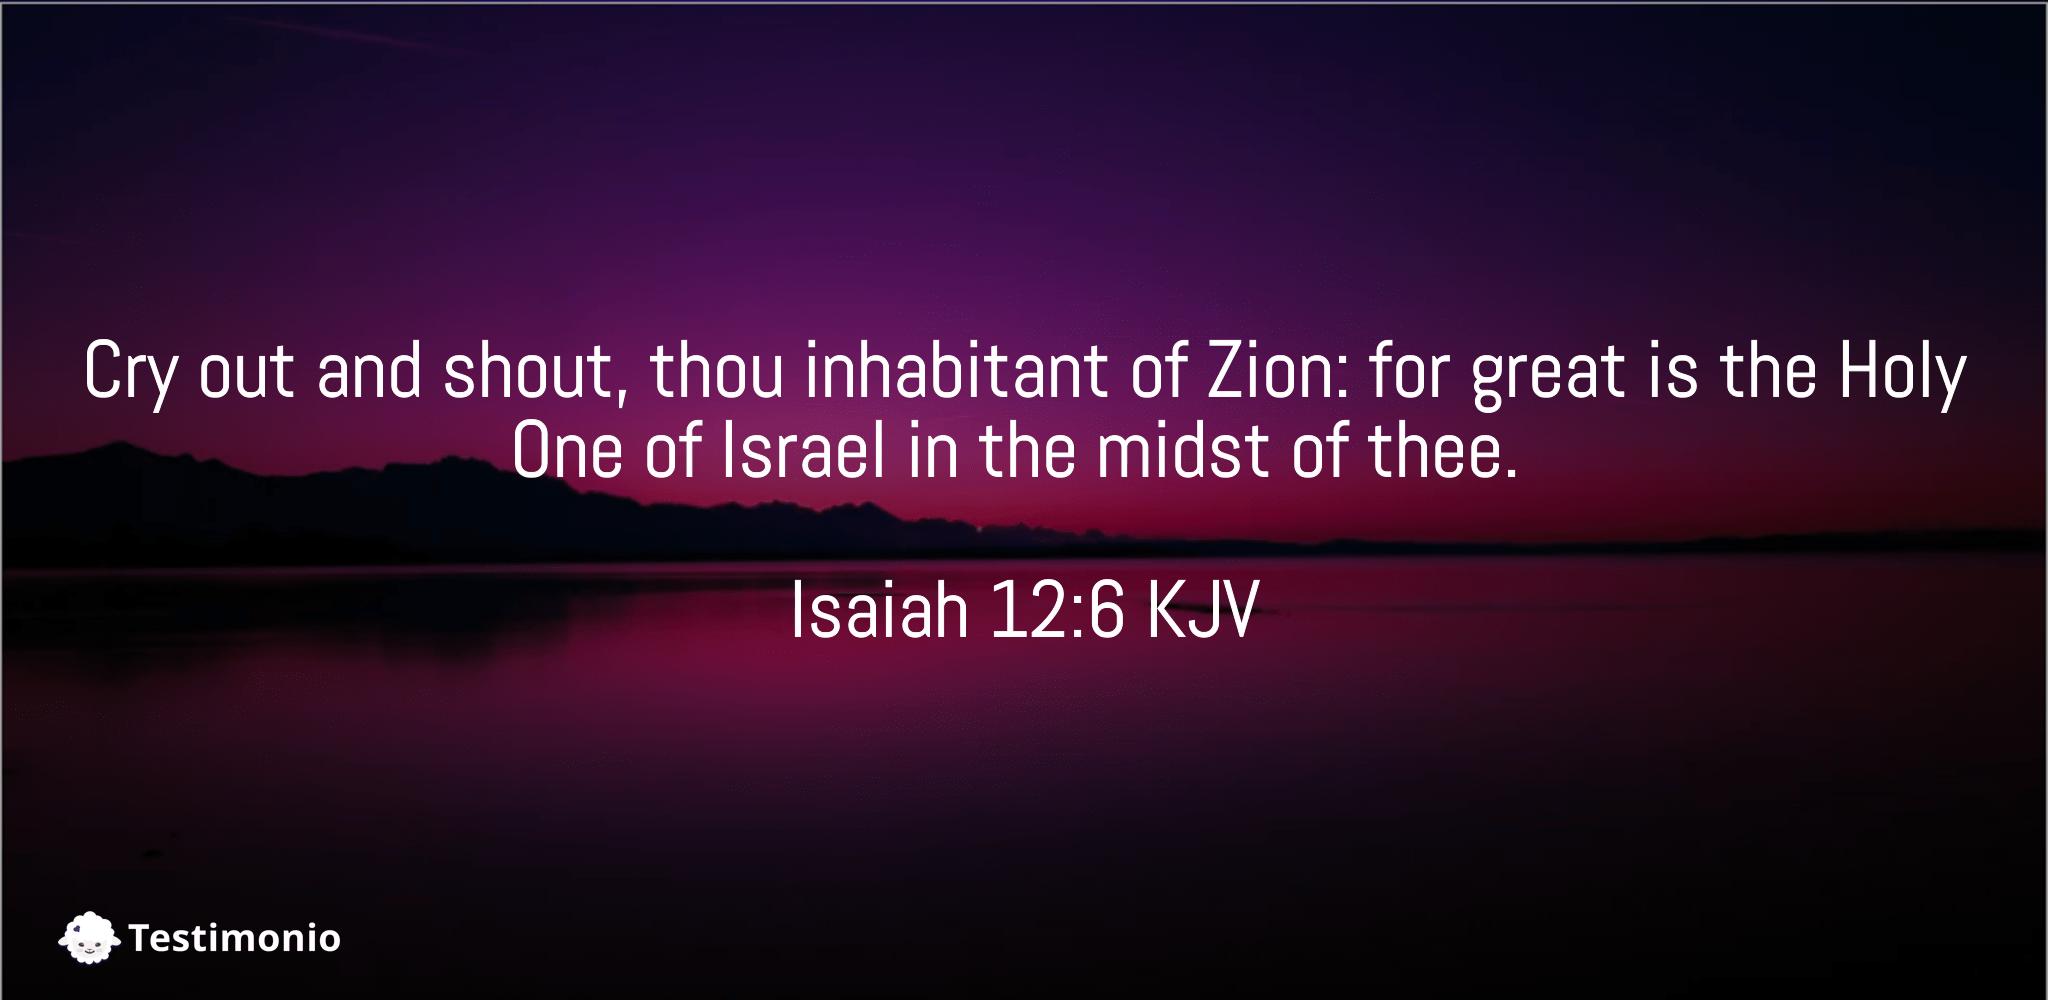 Isaiah 12:6